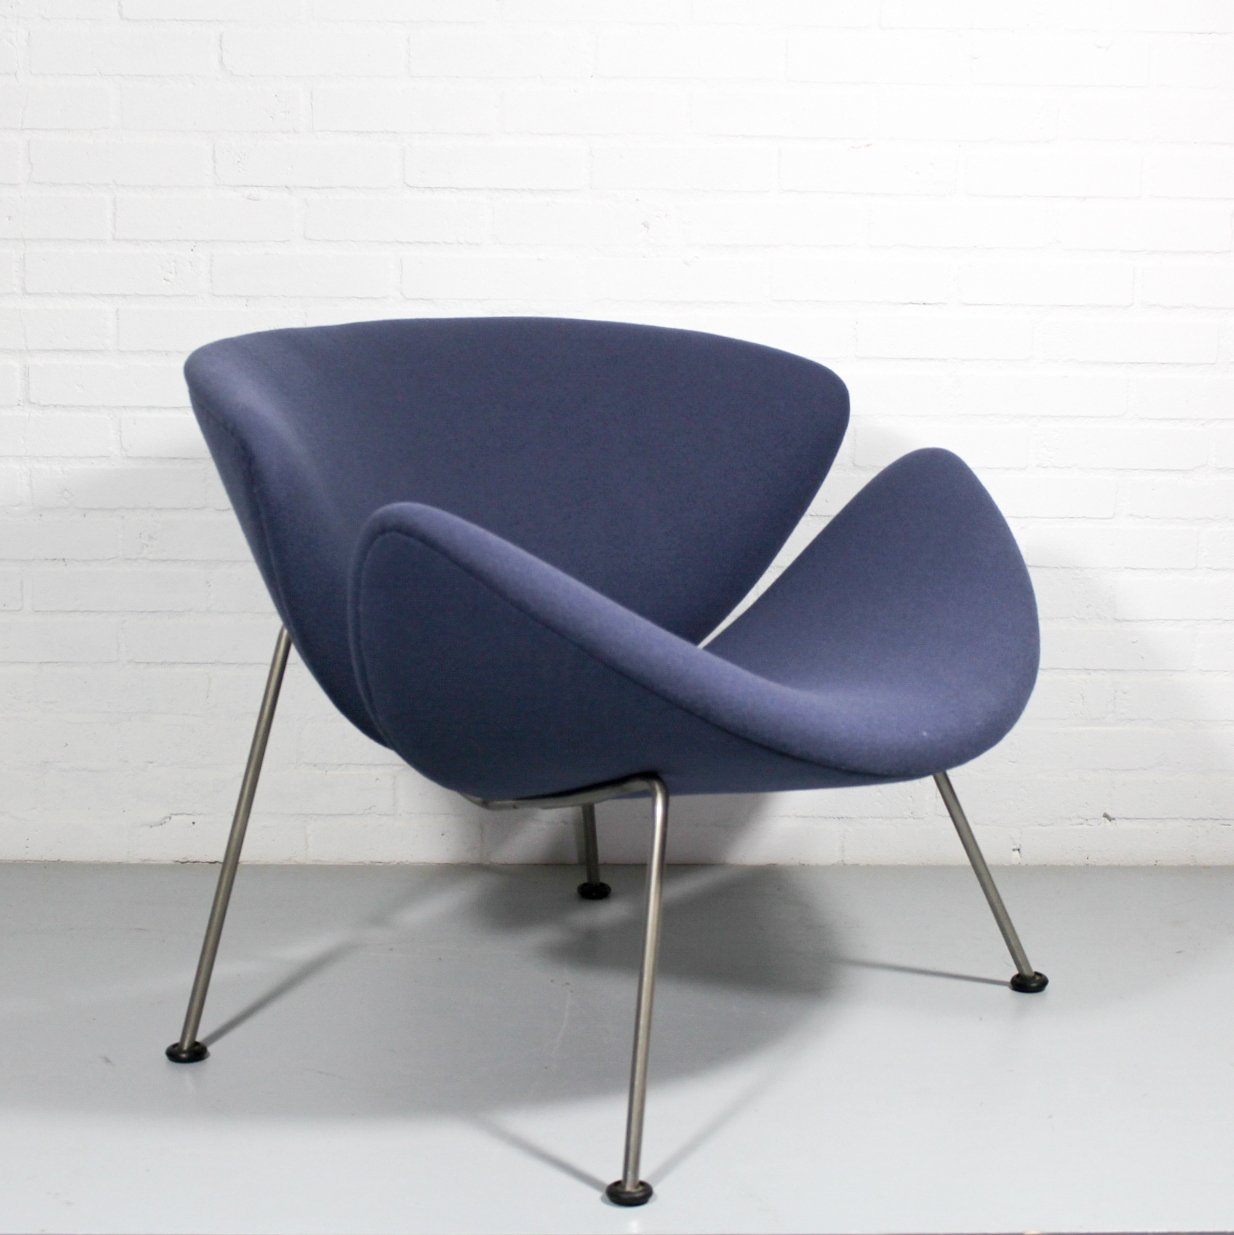 orange slice chair plastic beach chairs lounge by pierre paulin for artifort